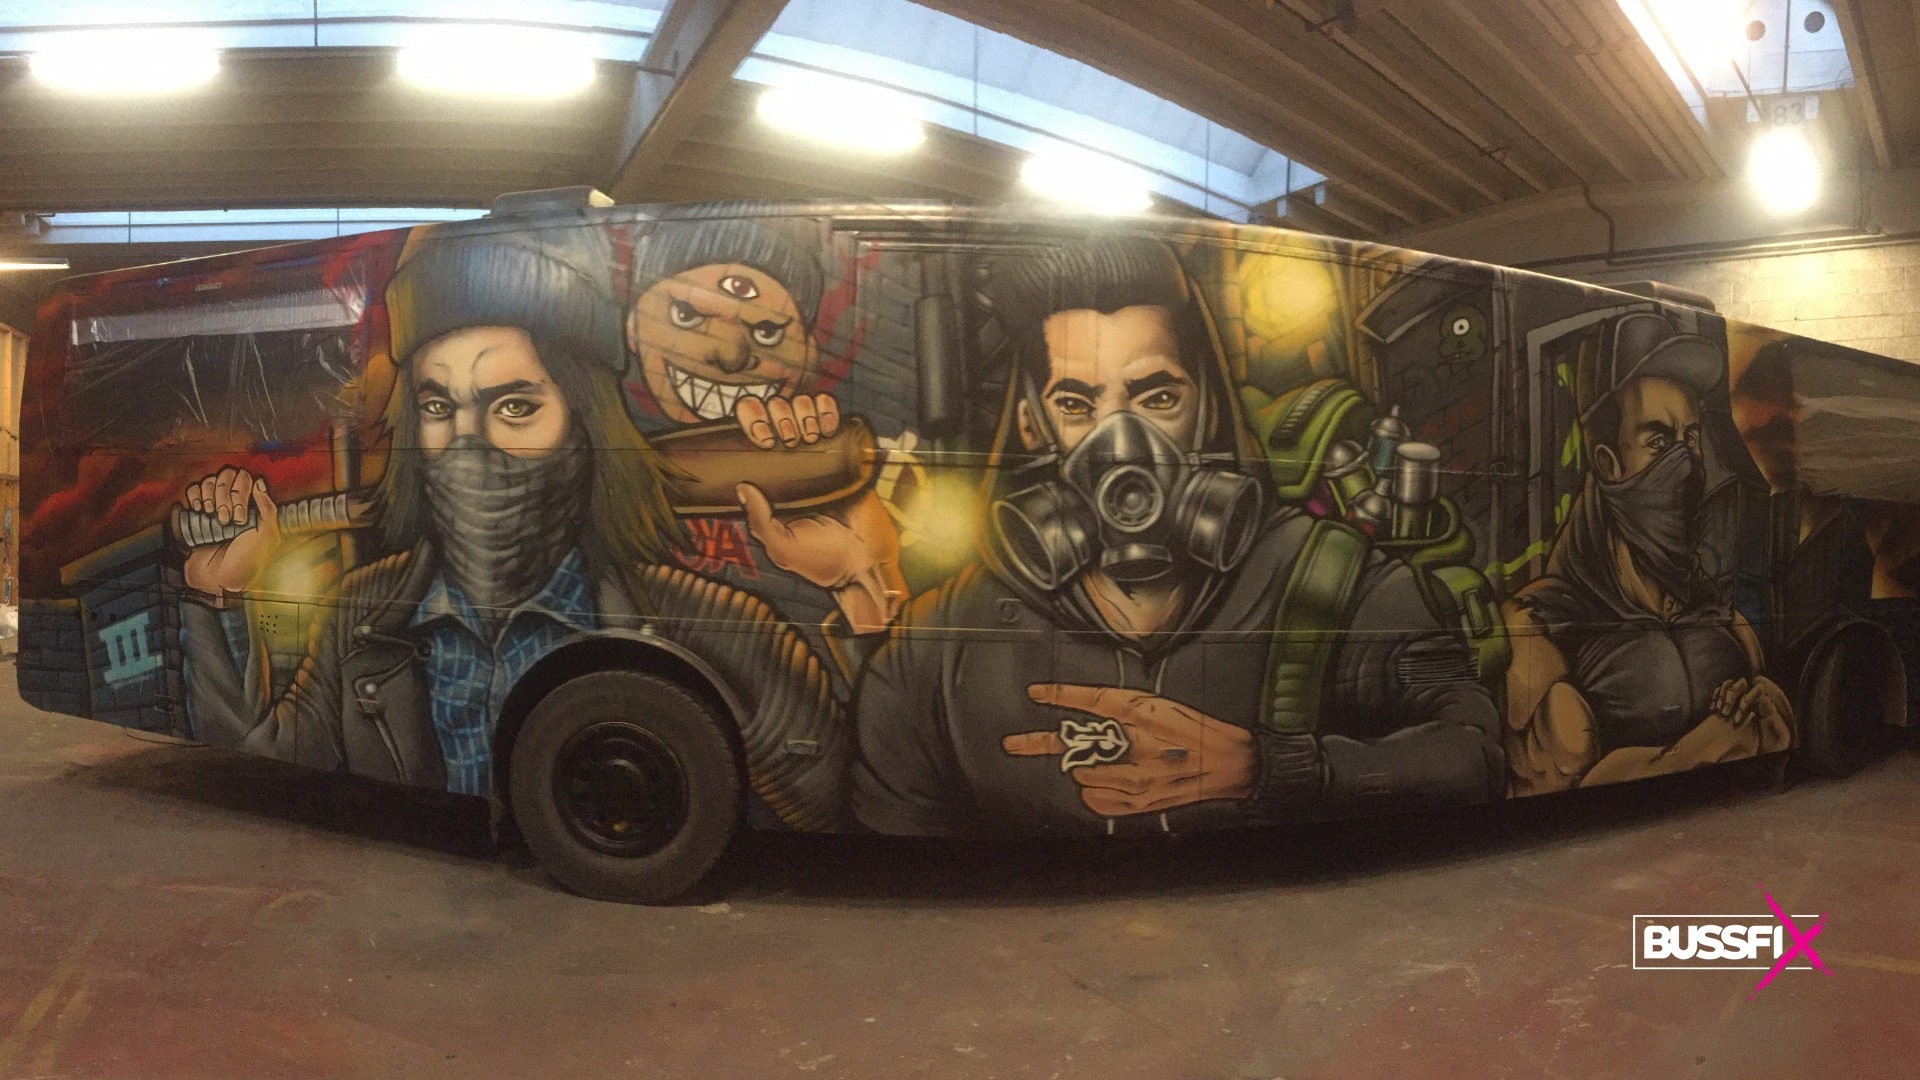 Graffiti russebuss 2019